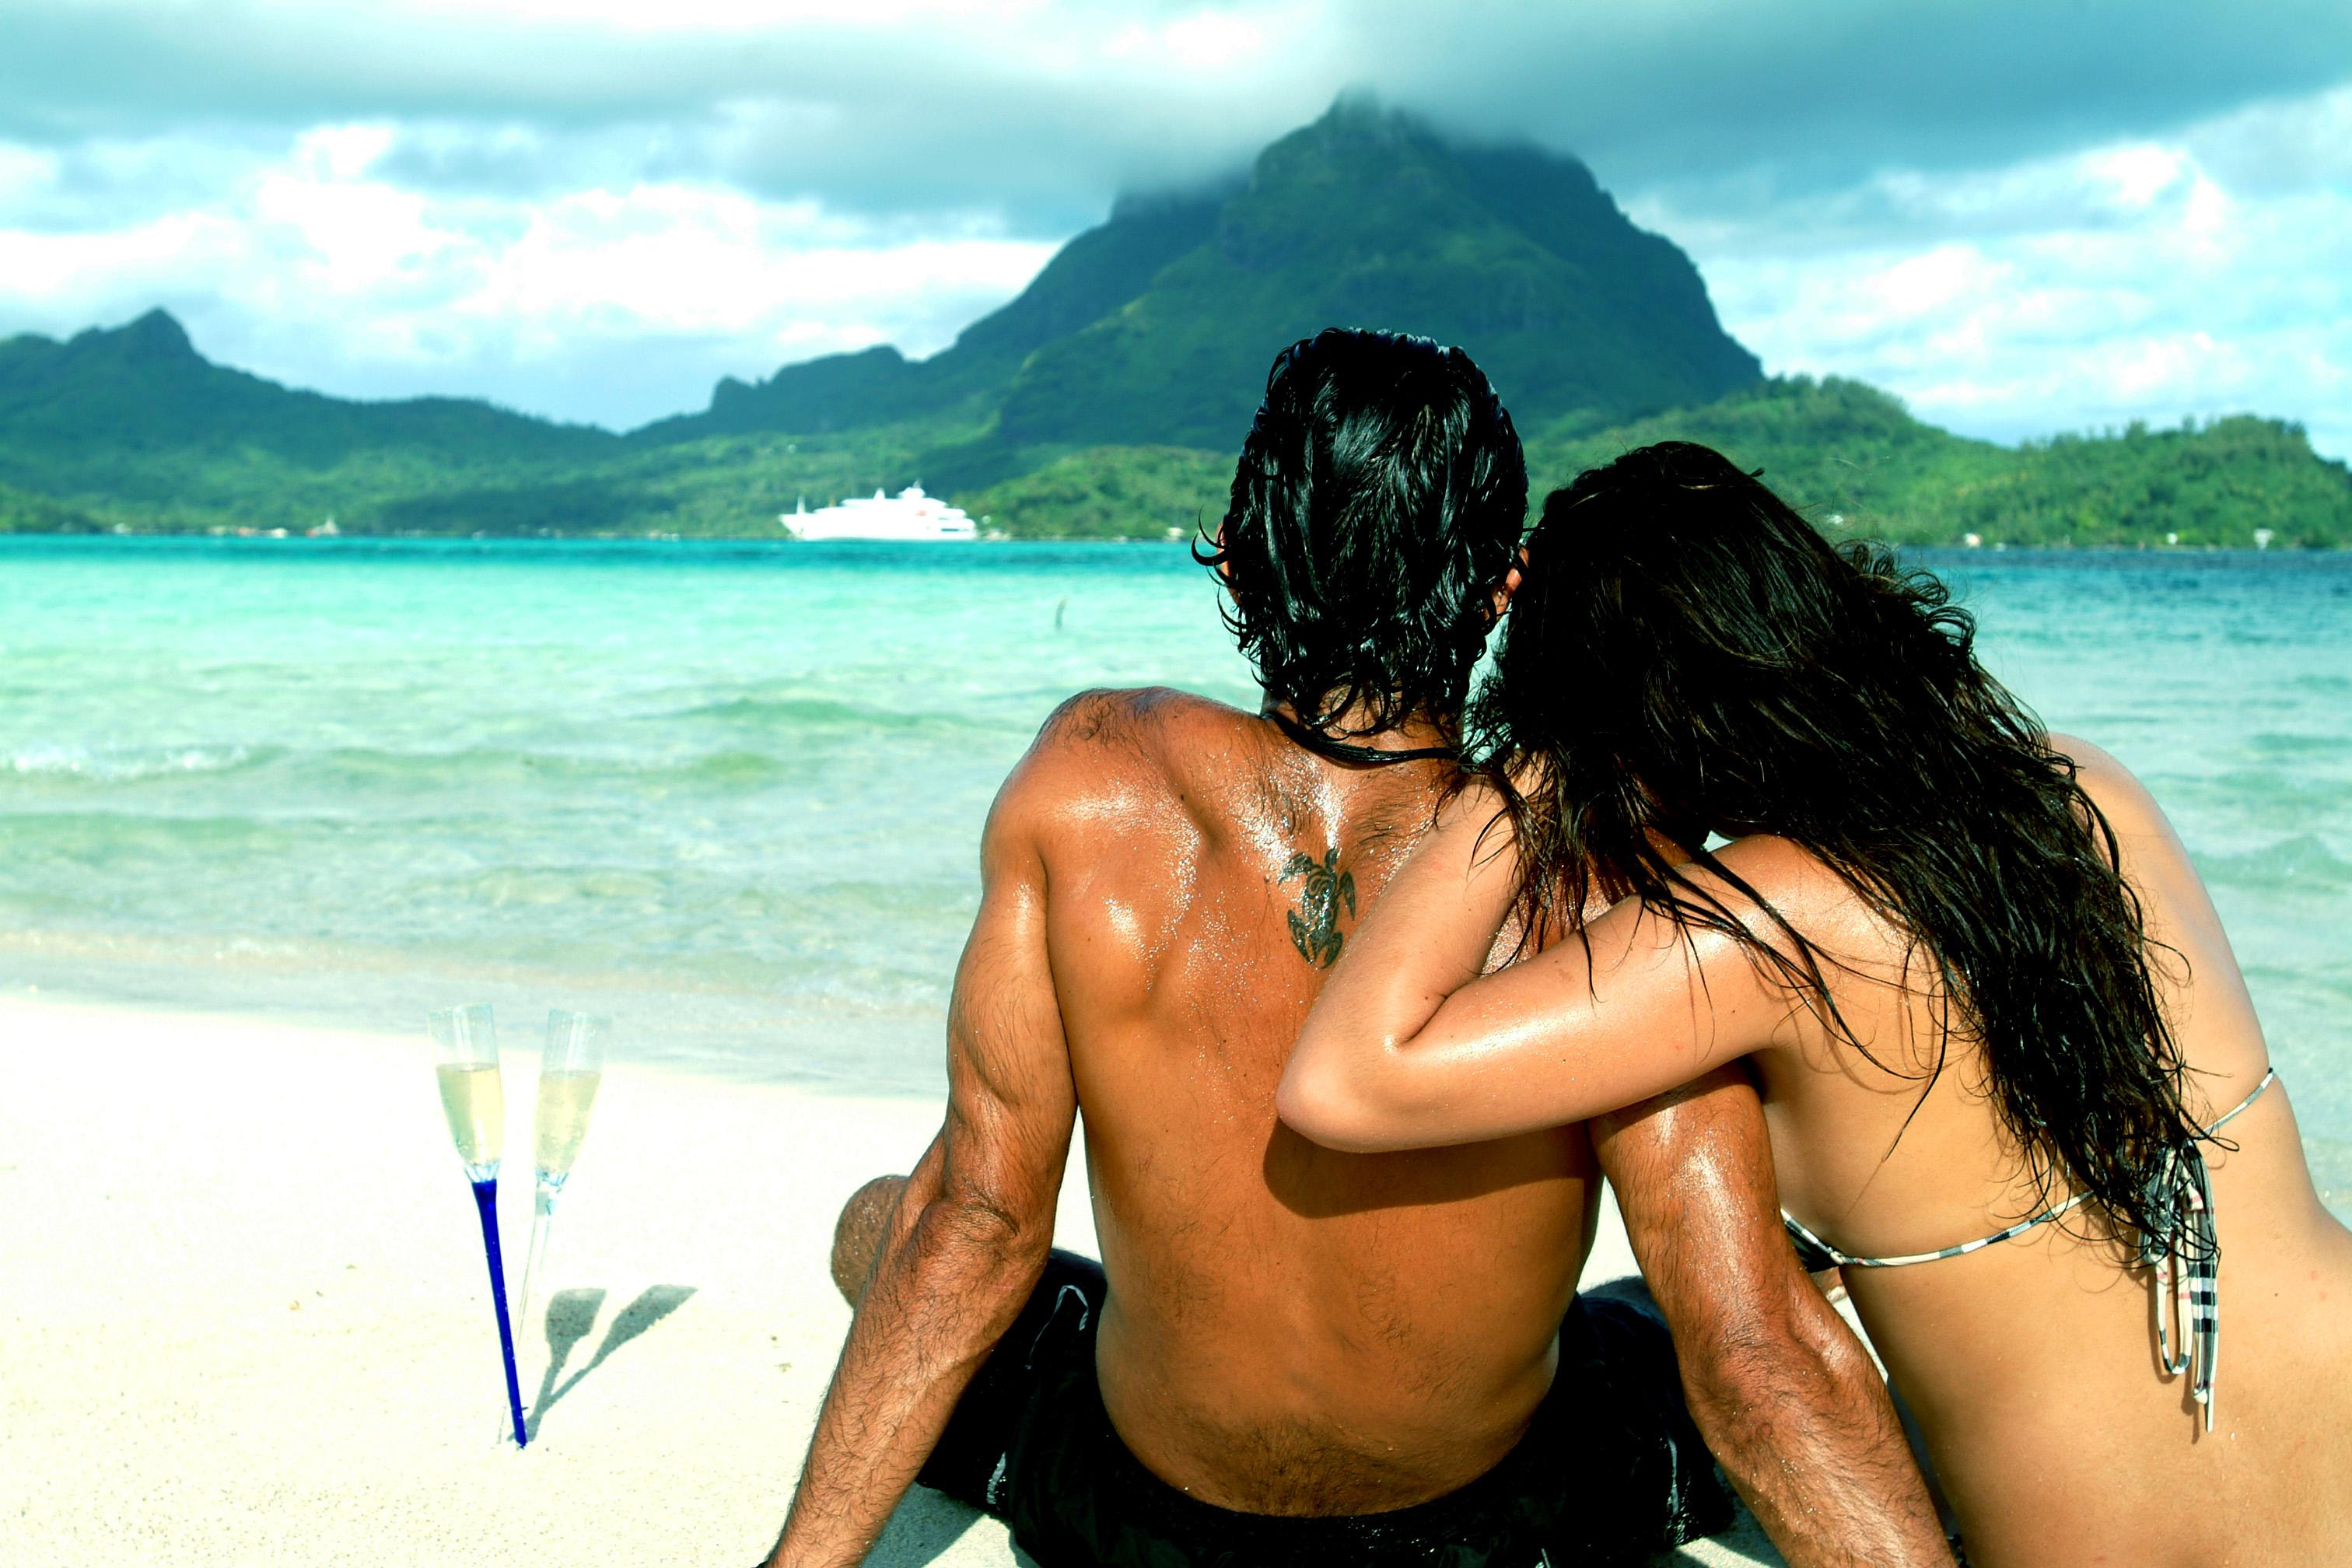 Фото красивых девушек с парнями на пляже